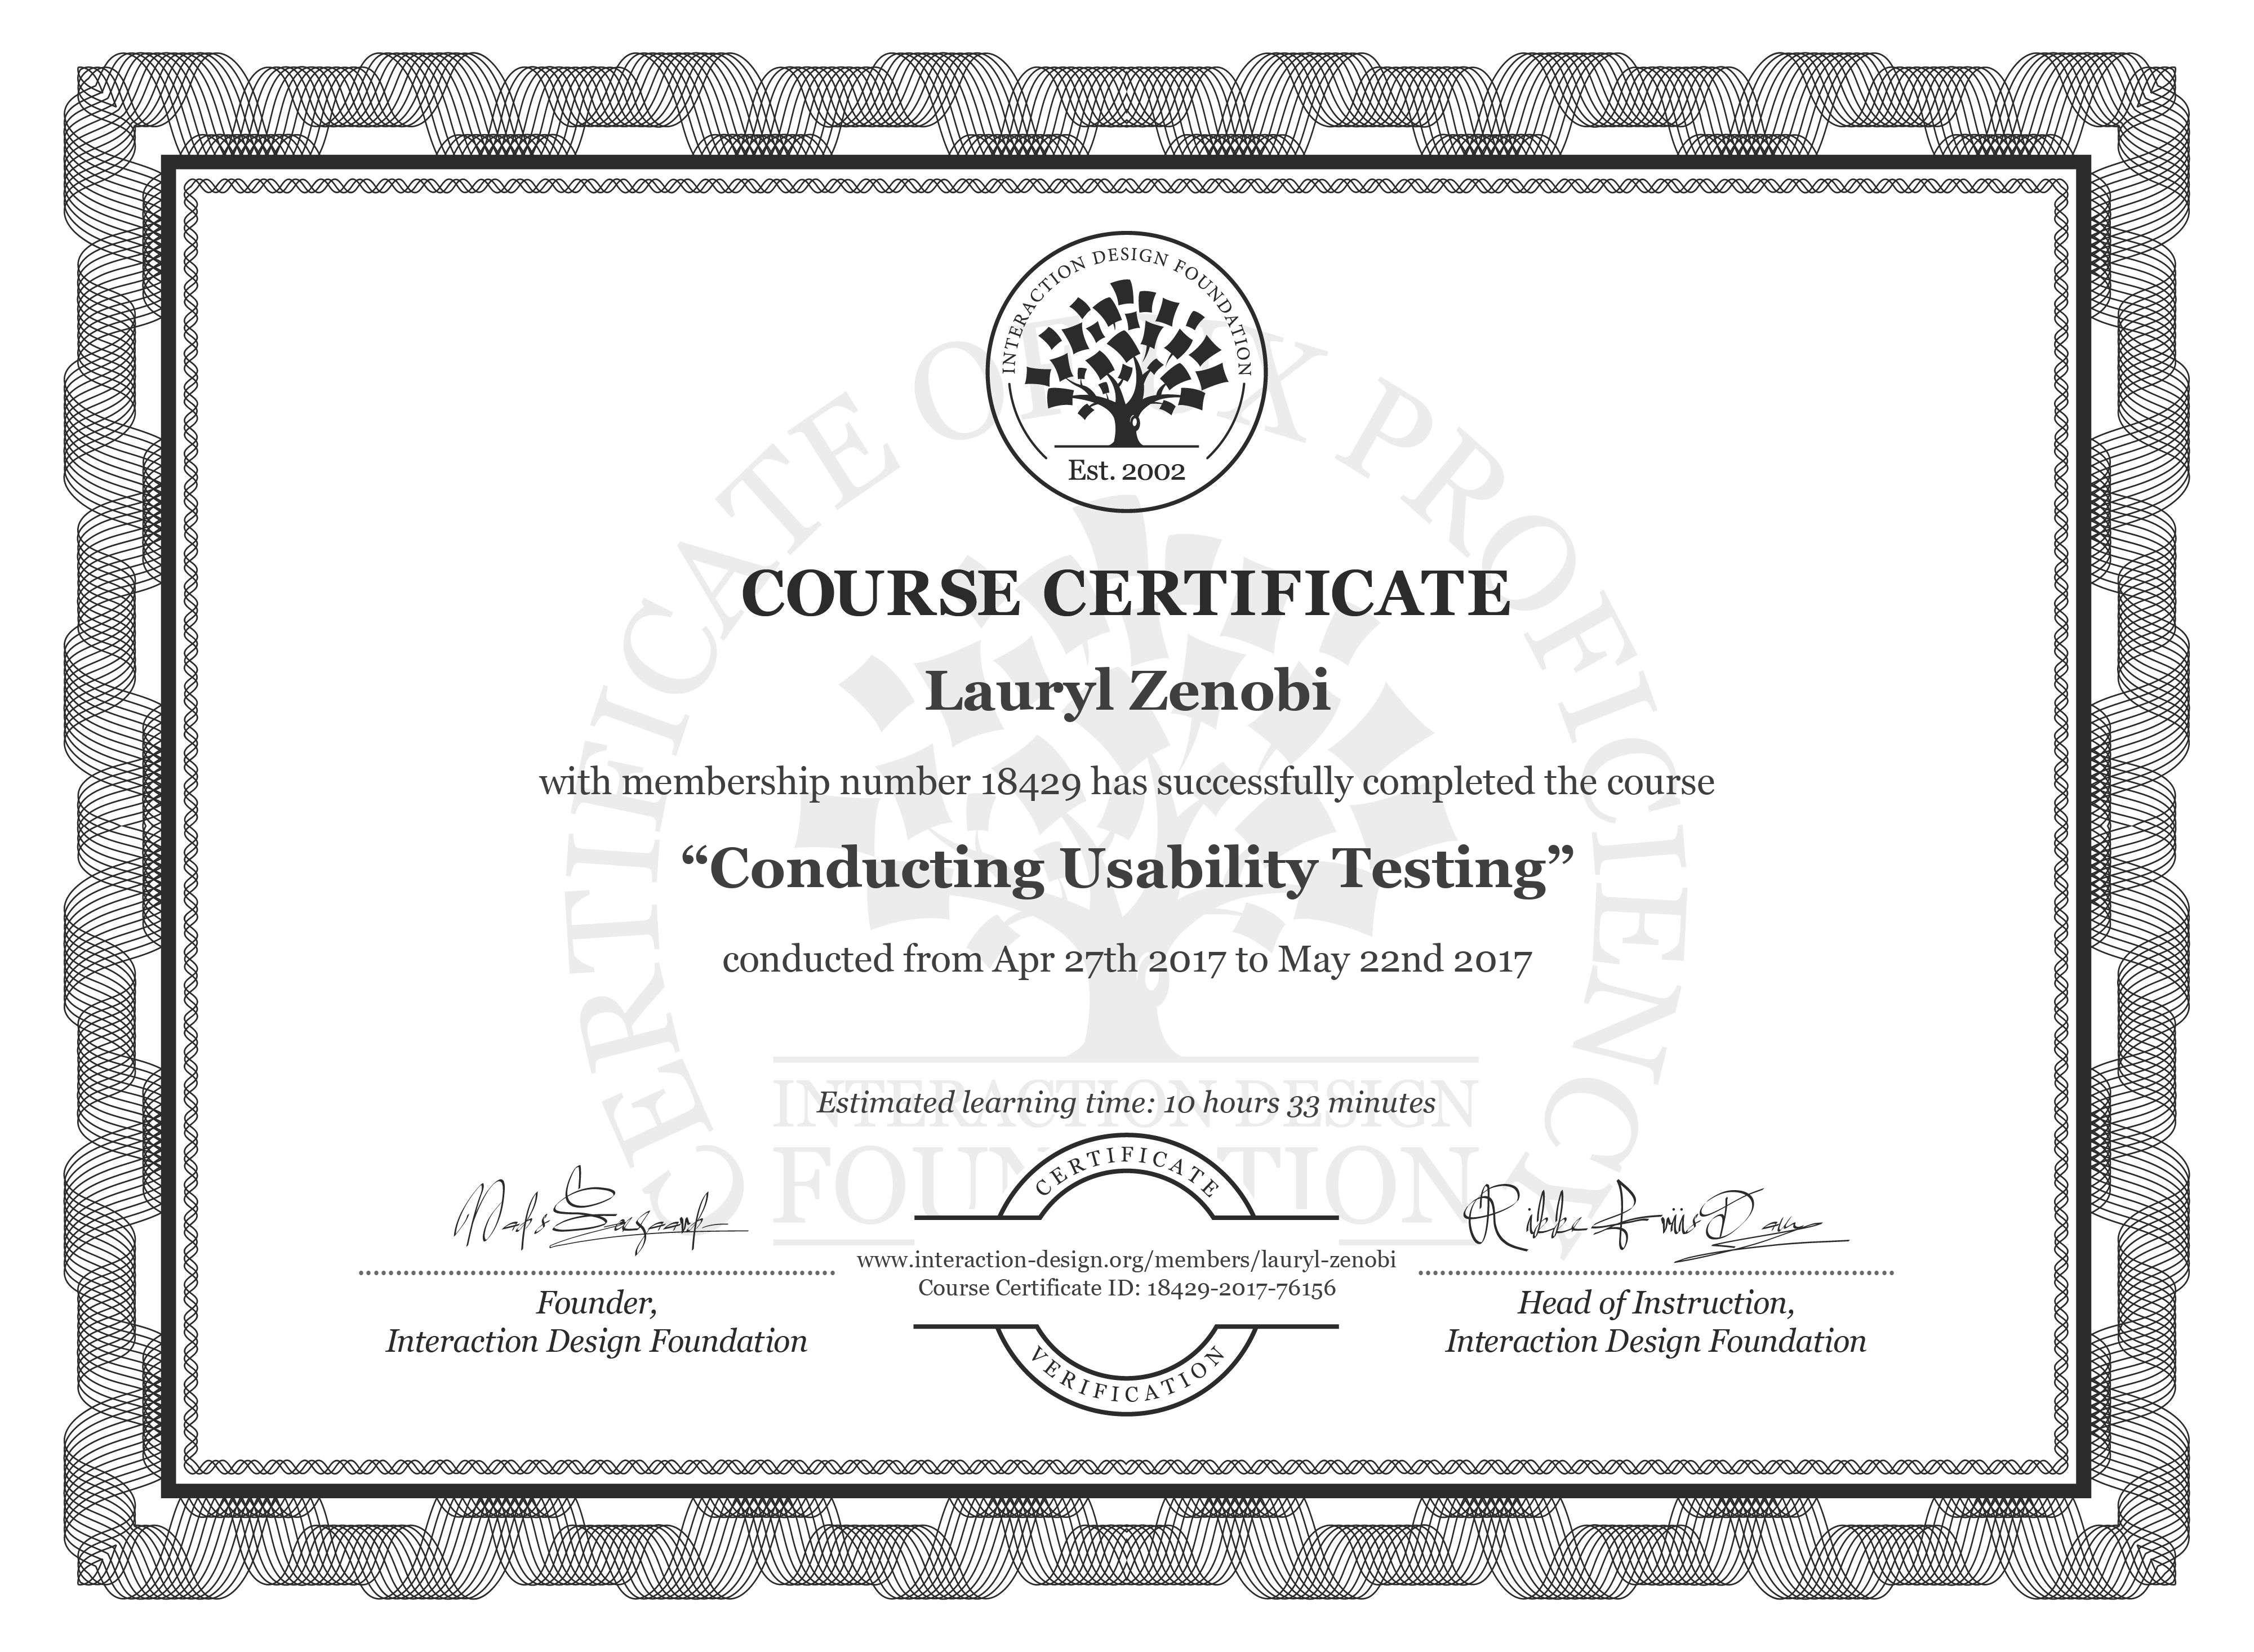 Lauryl Zenobi: Course Certificate - Conducting Usability Testing